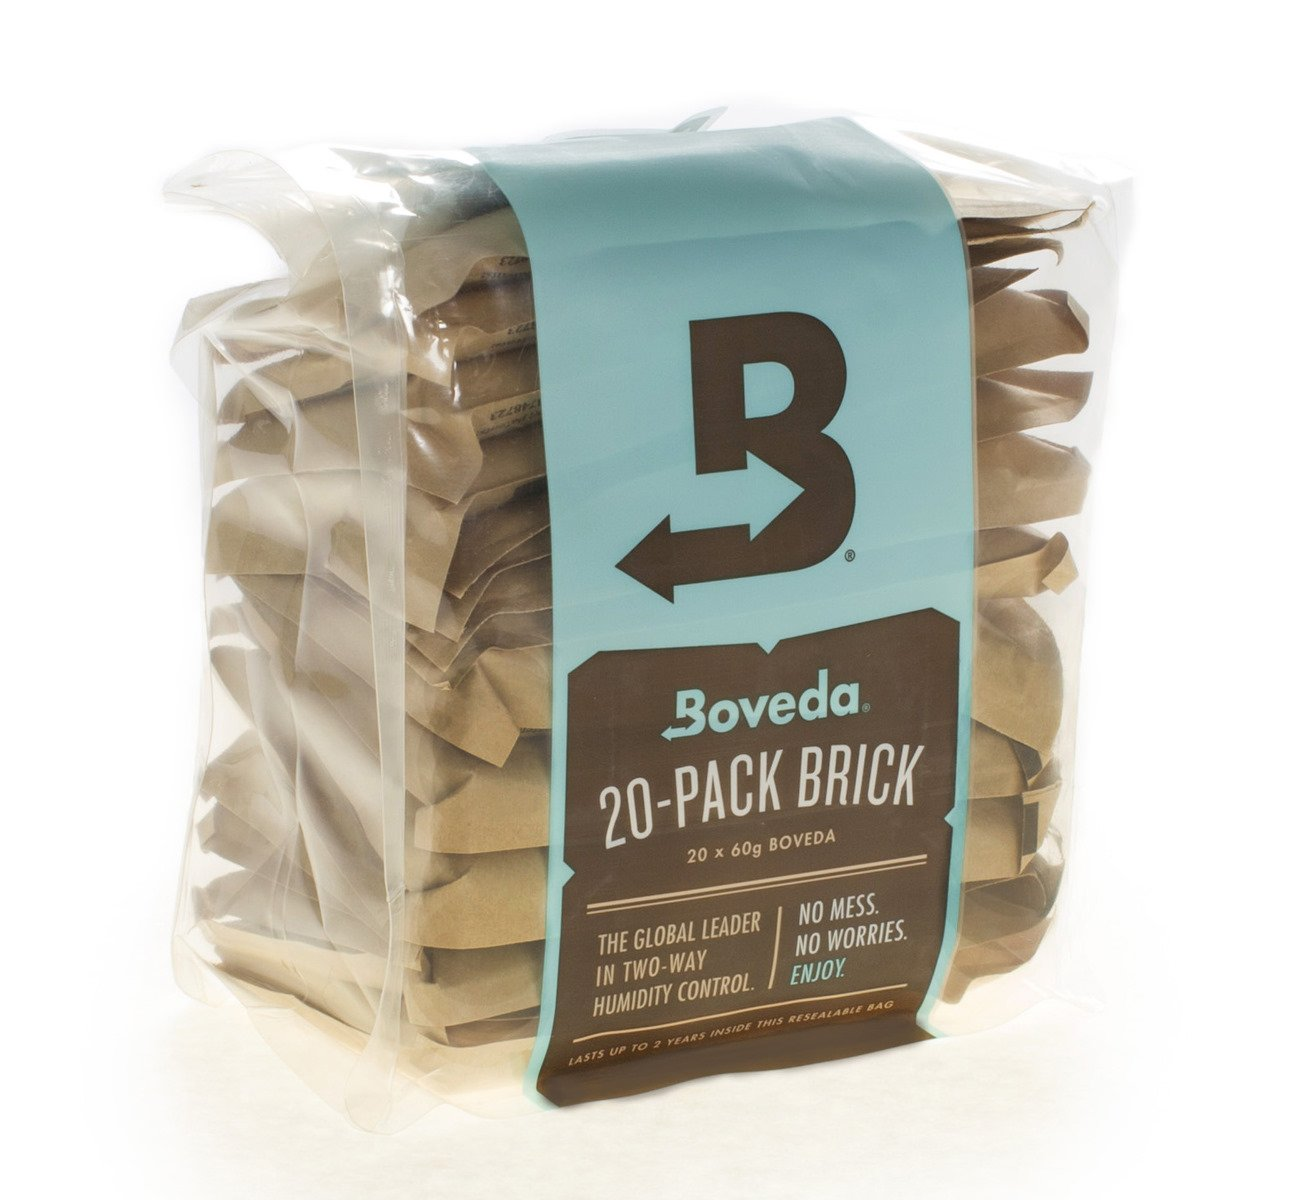 Boveda 58 Percent RH 2-Way Humidity Control, Large 67 gram size - 20-Pack Bulk Brick